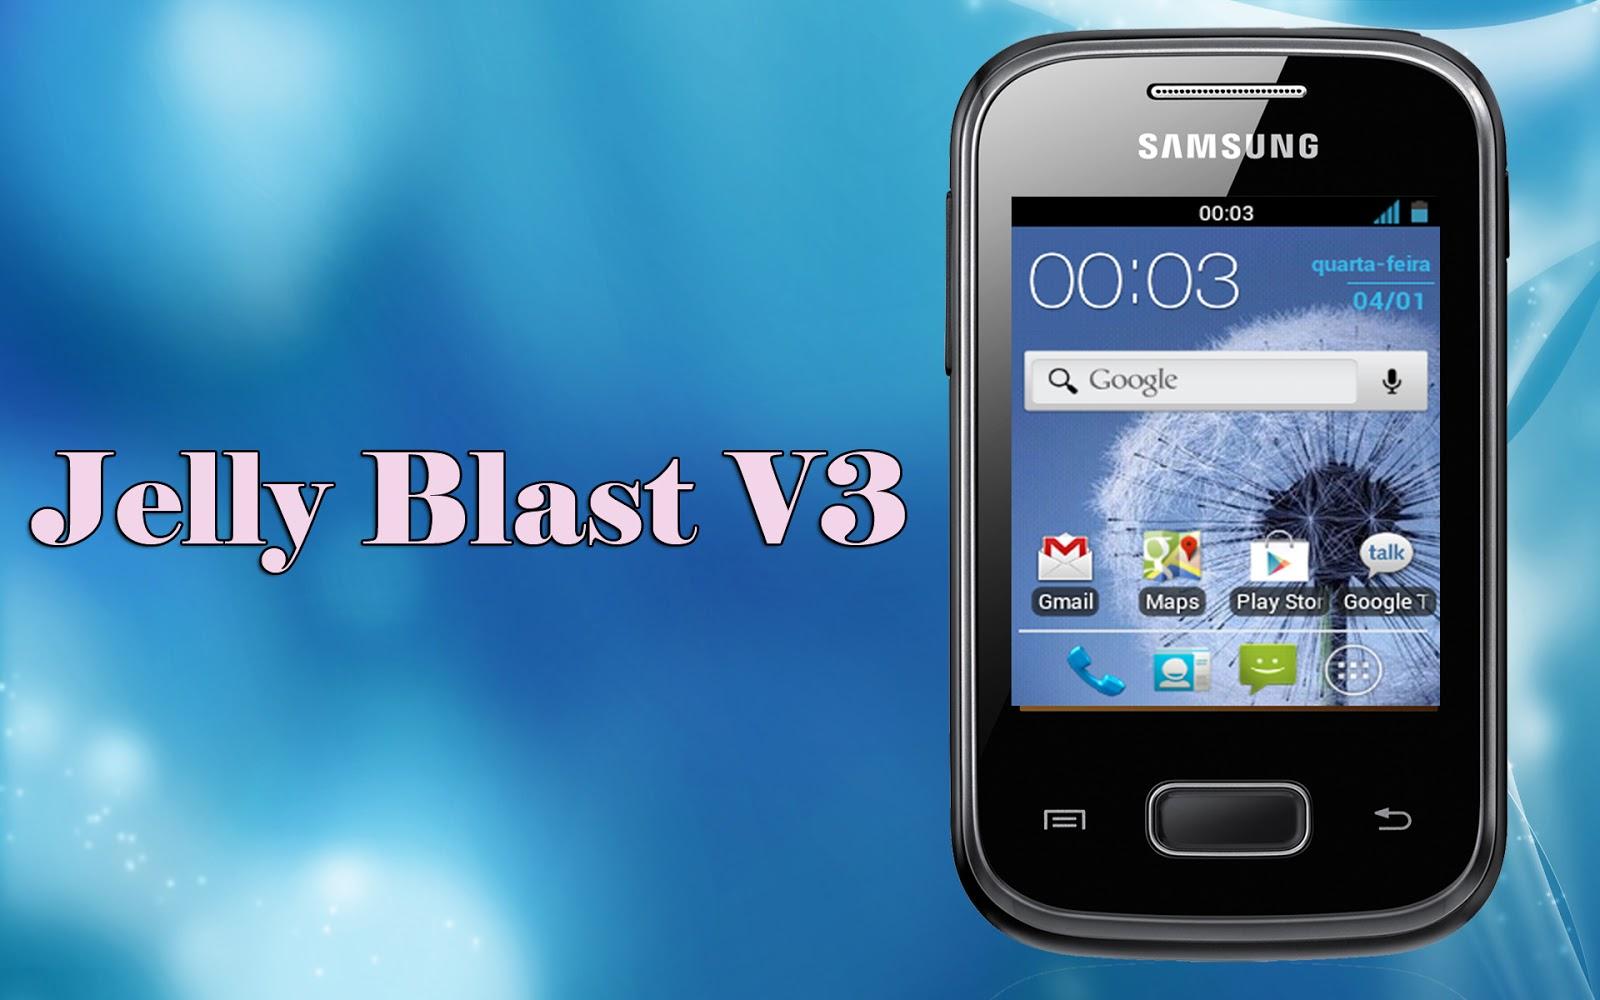 Download jellyblast v3.zip zipy share